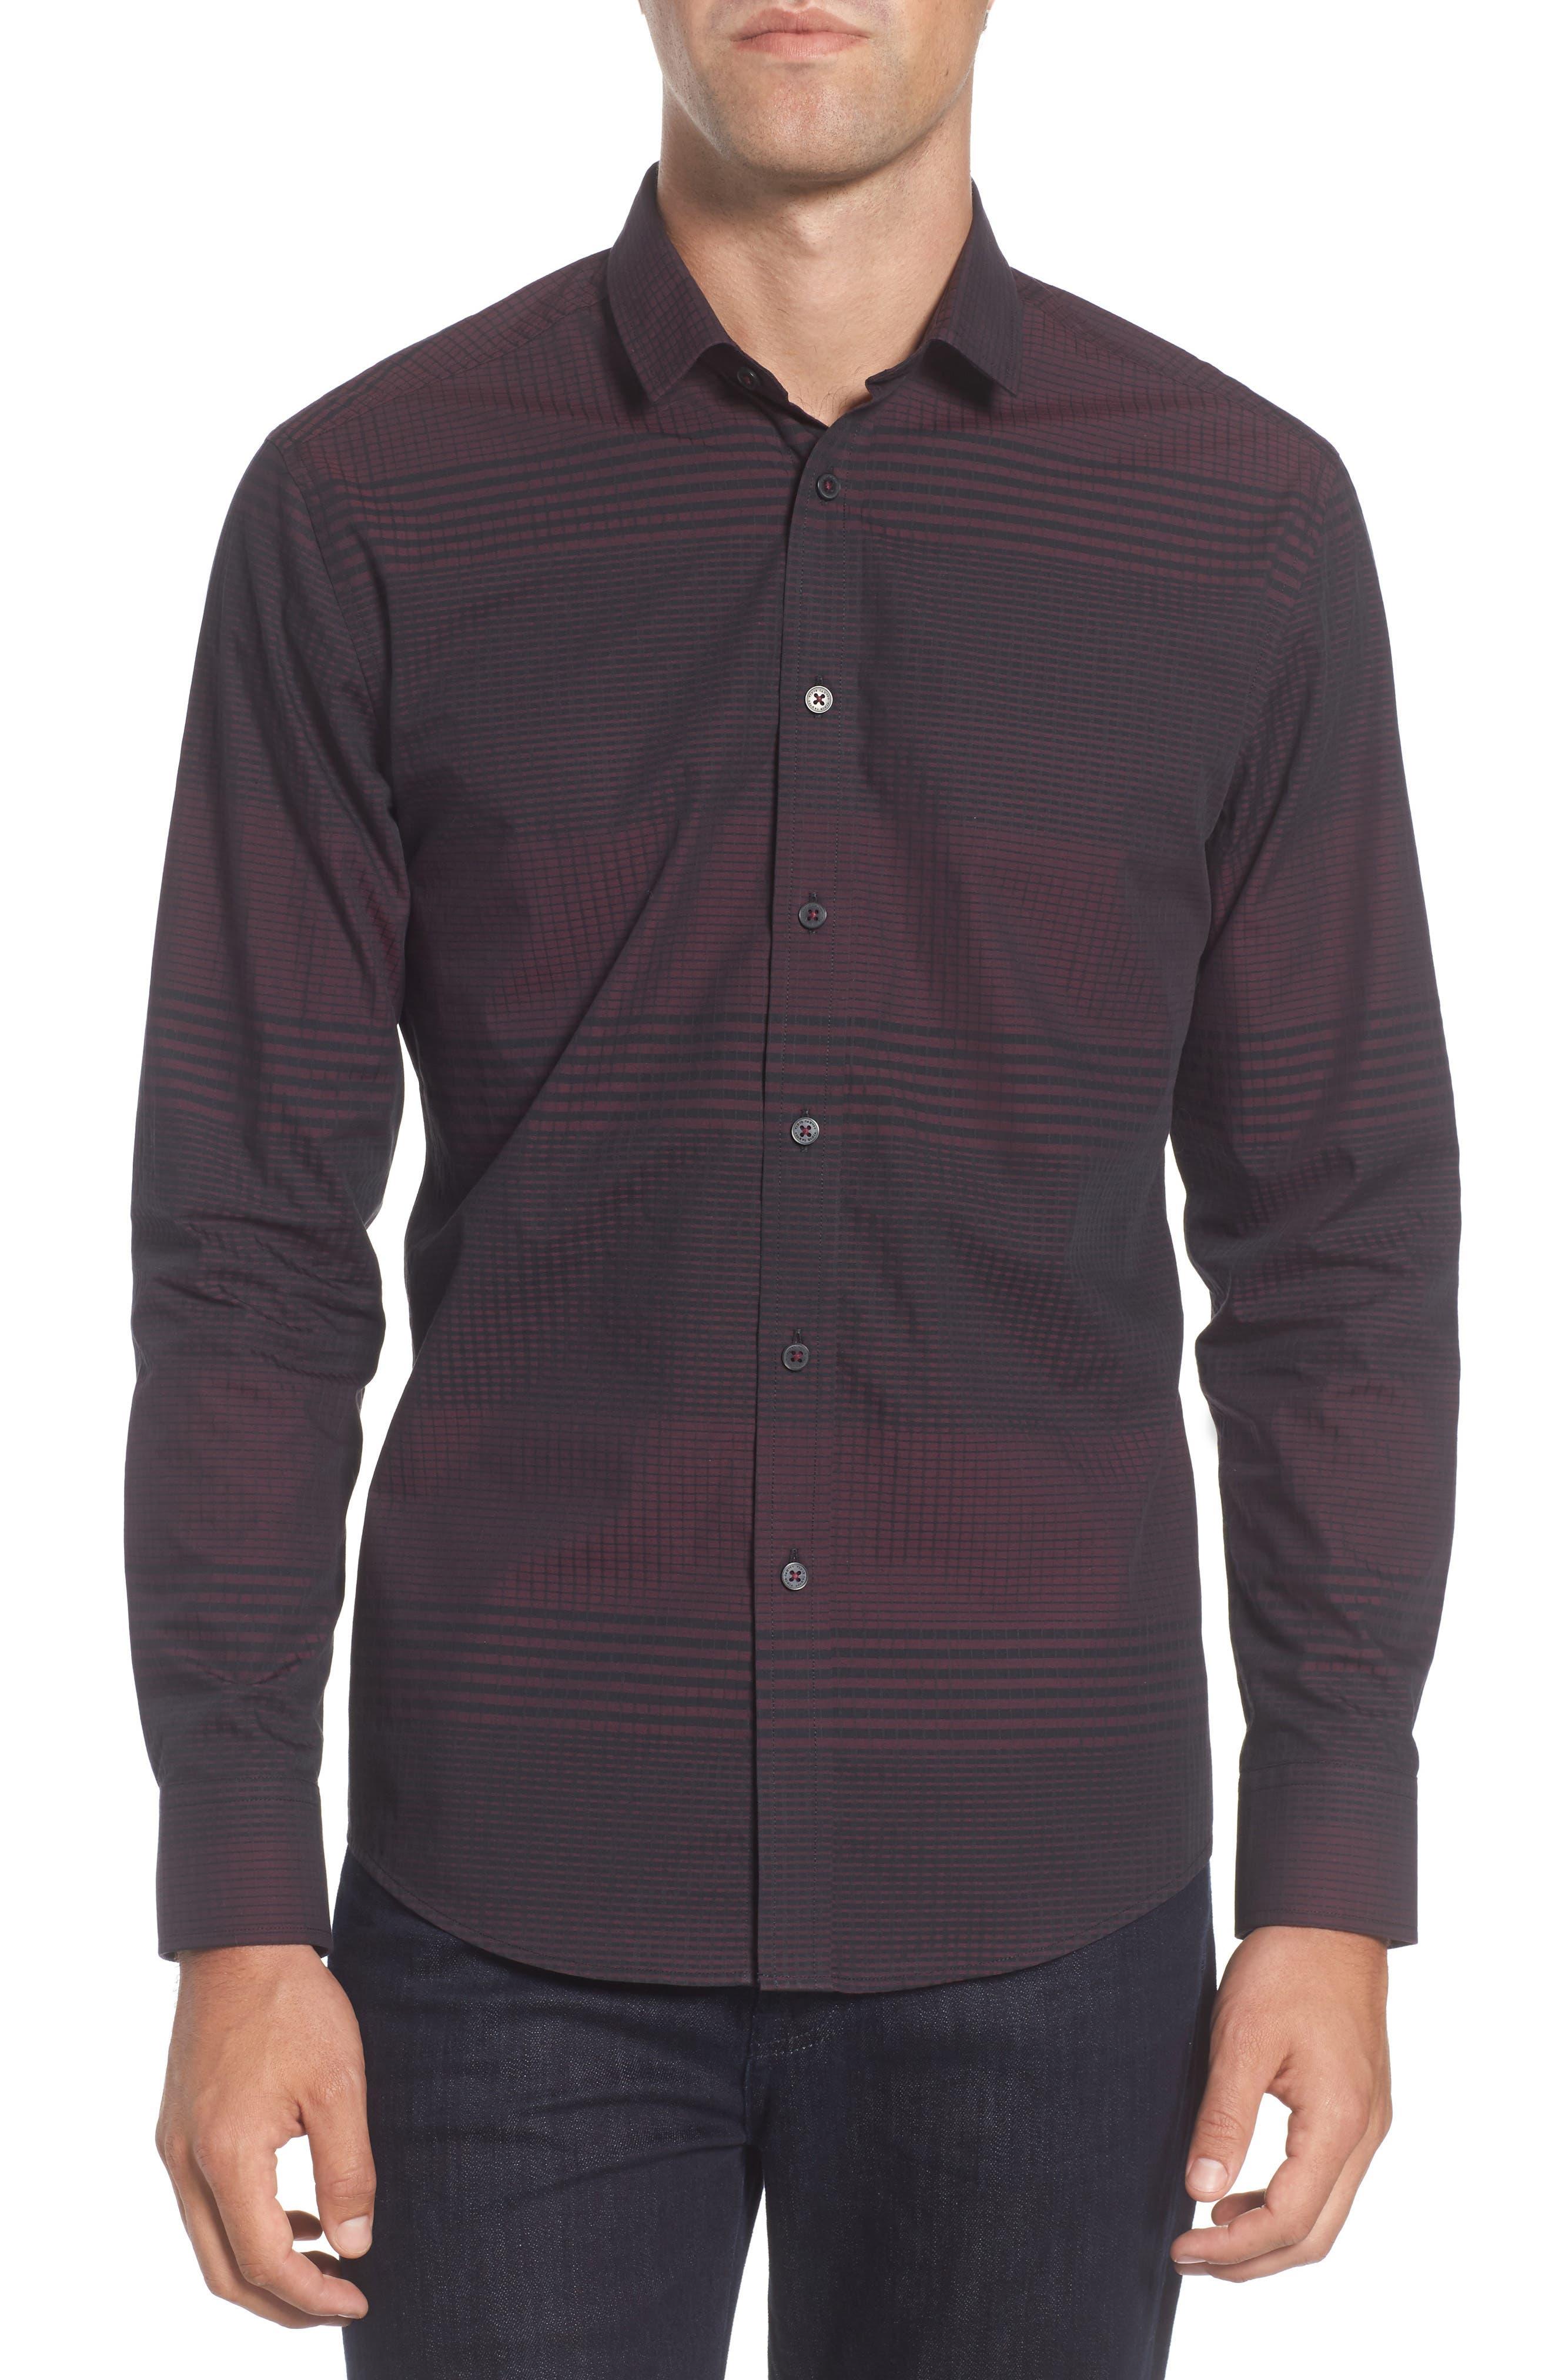 Slim Fit Check Plaid Sport Shirt,                             Main thumbnail 1, color,                             BURGUNDY/ BLACK CHECK PLAID